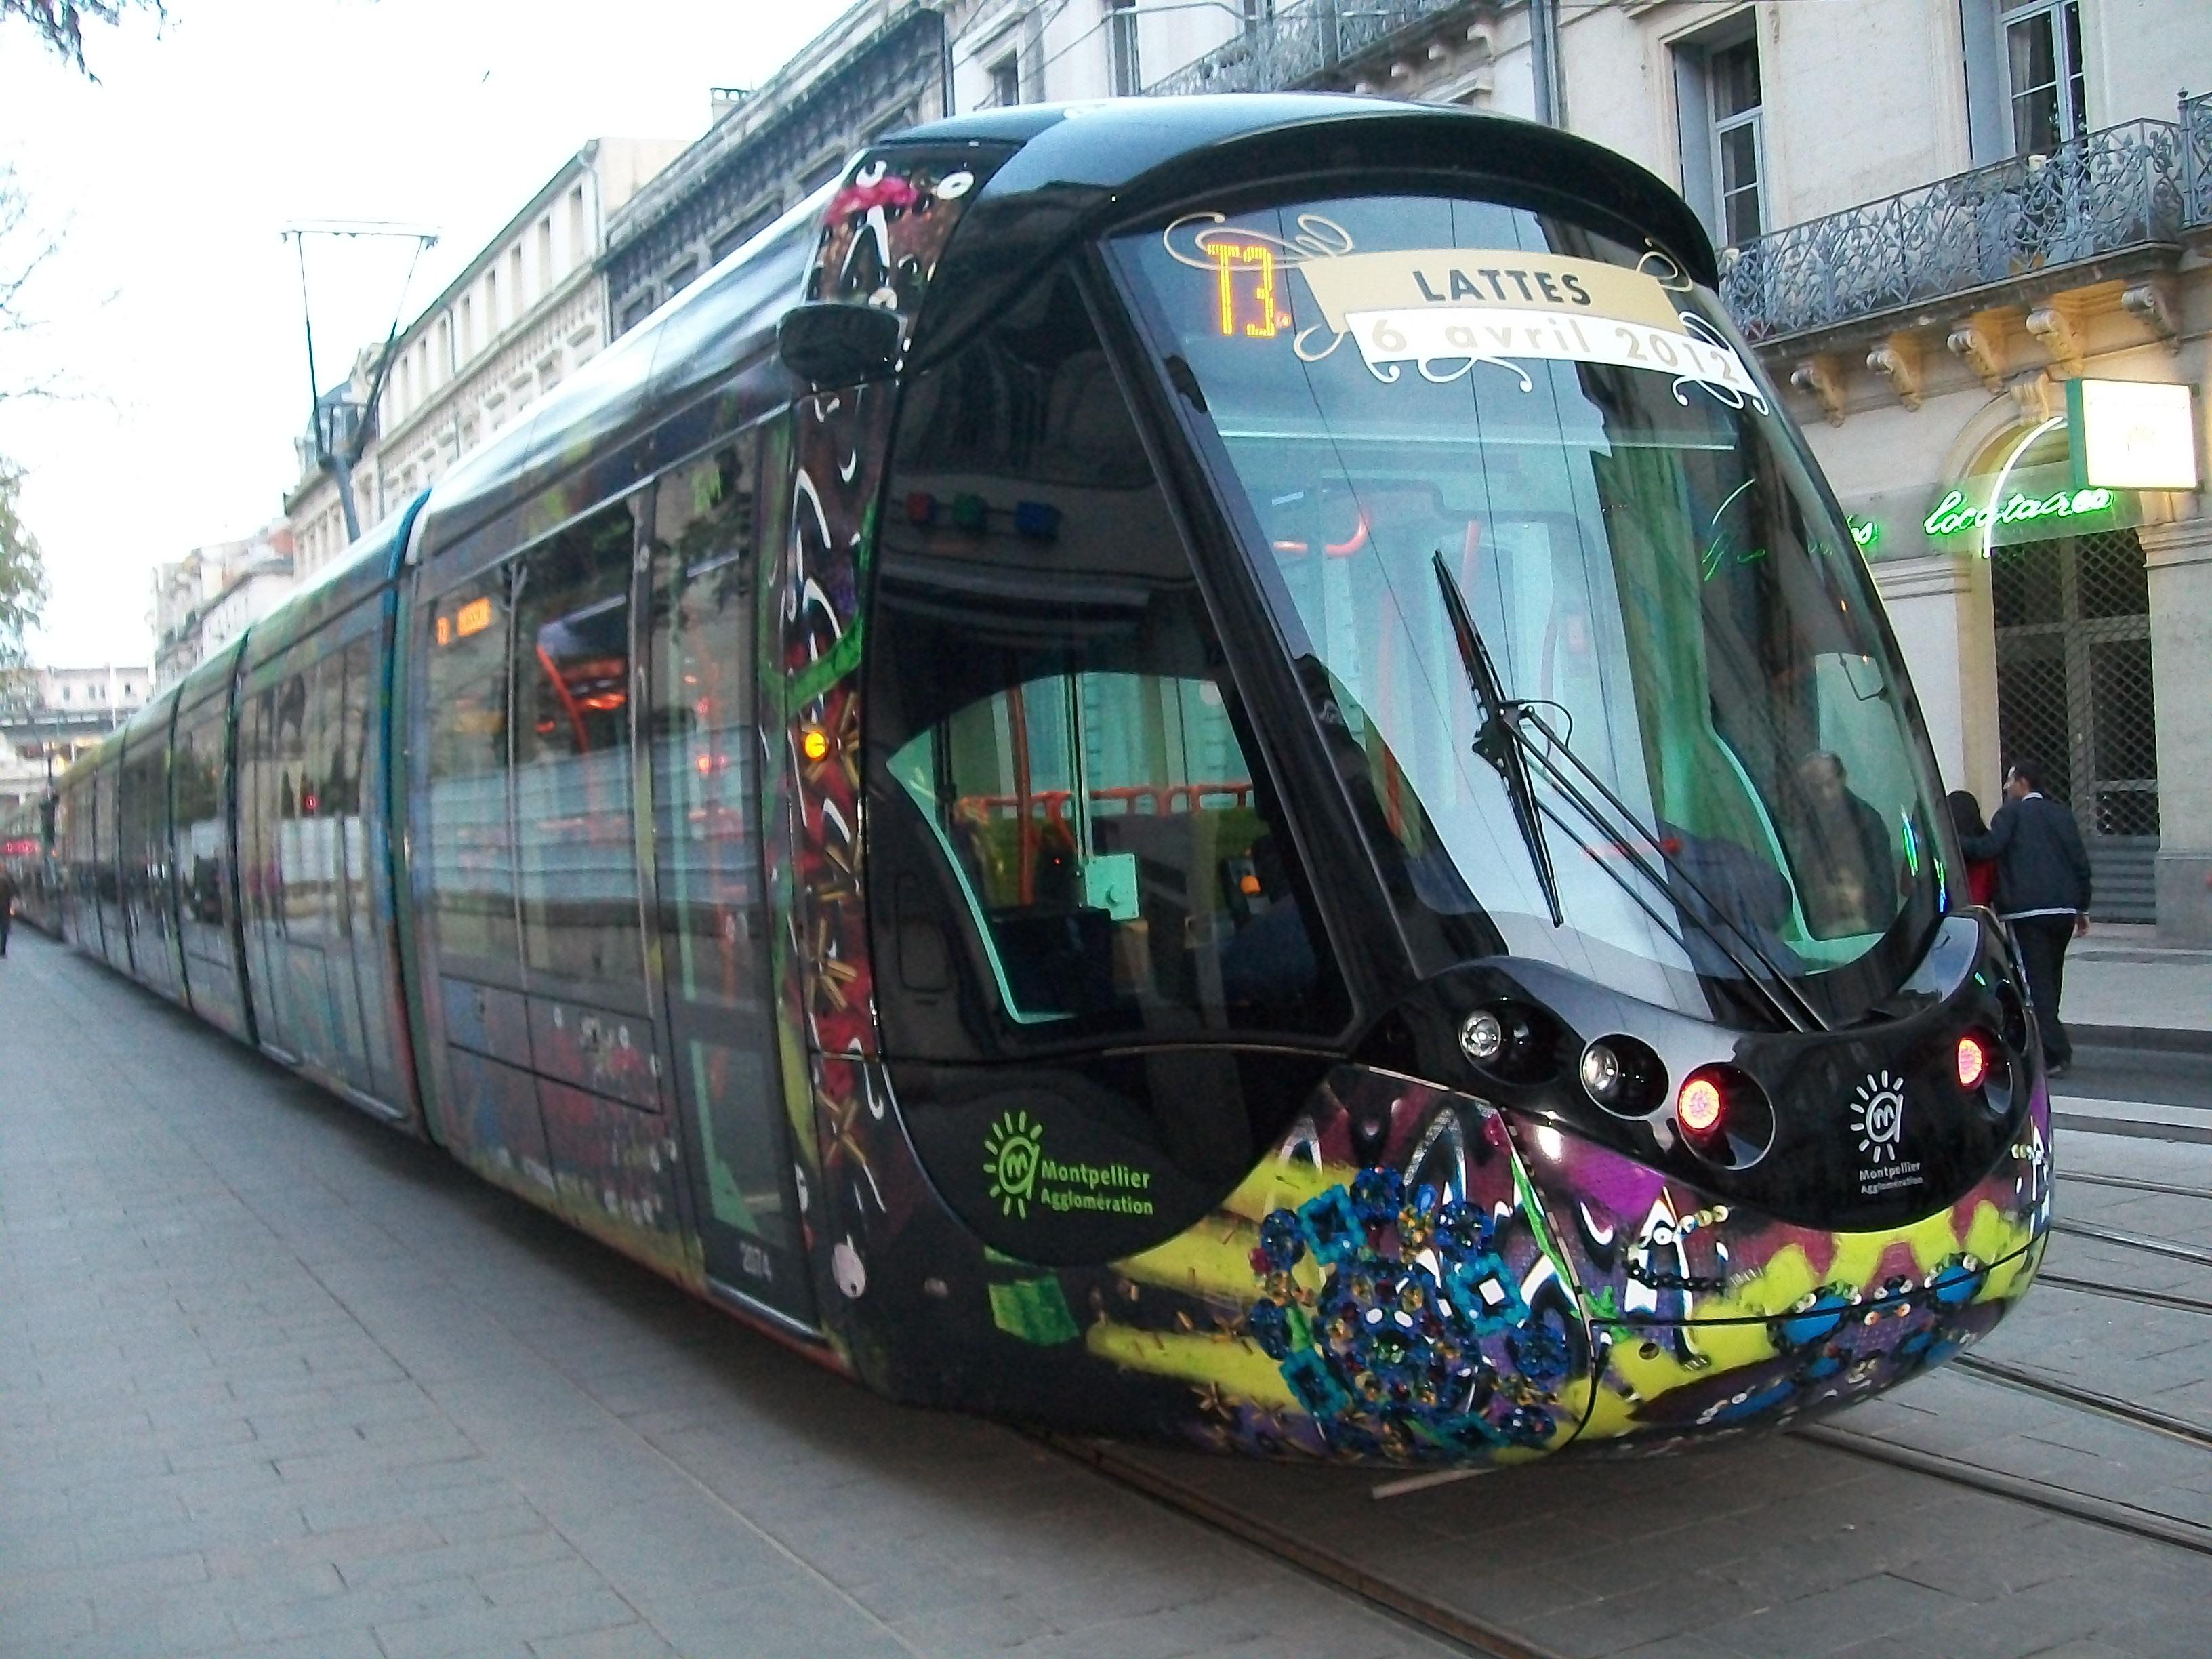 Train decoration designed by Lacroix. Image via Wikimedia Commons.